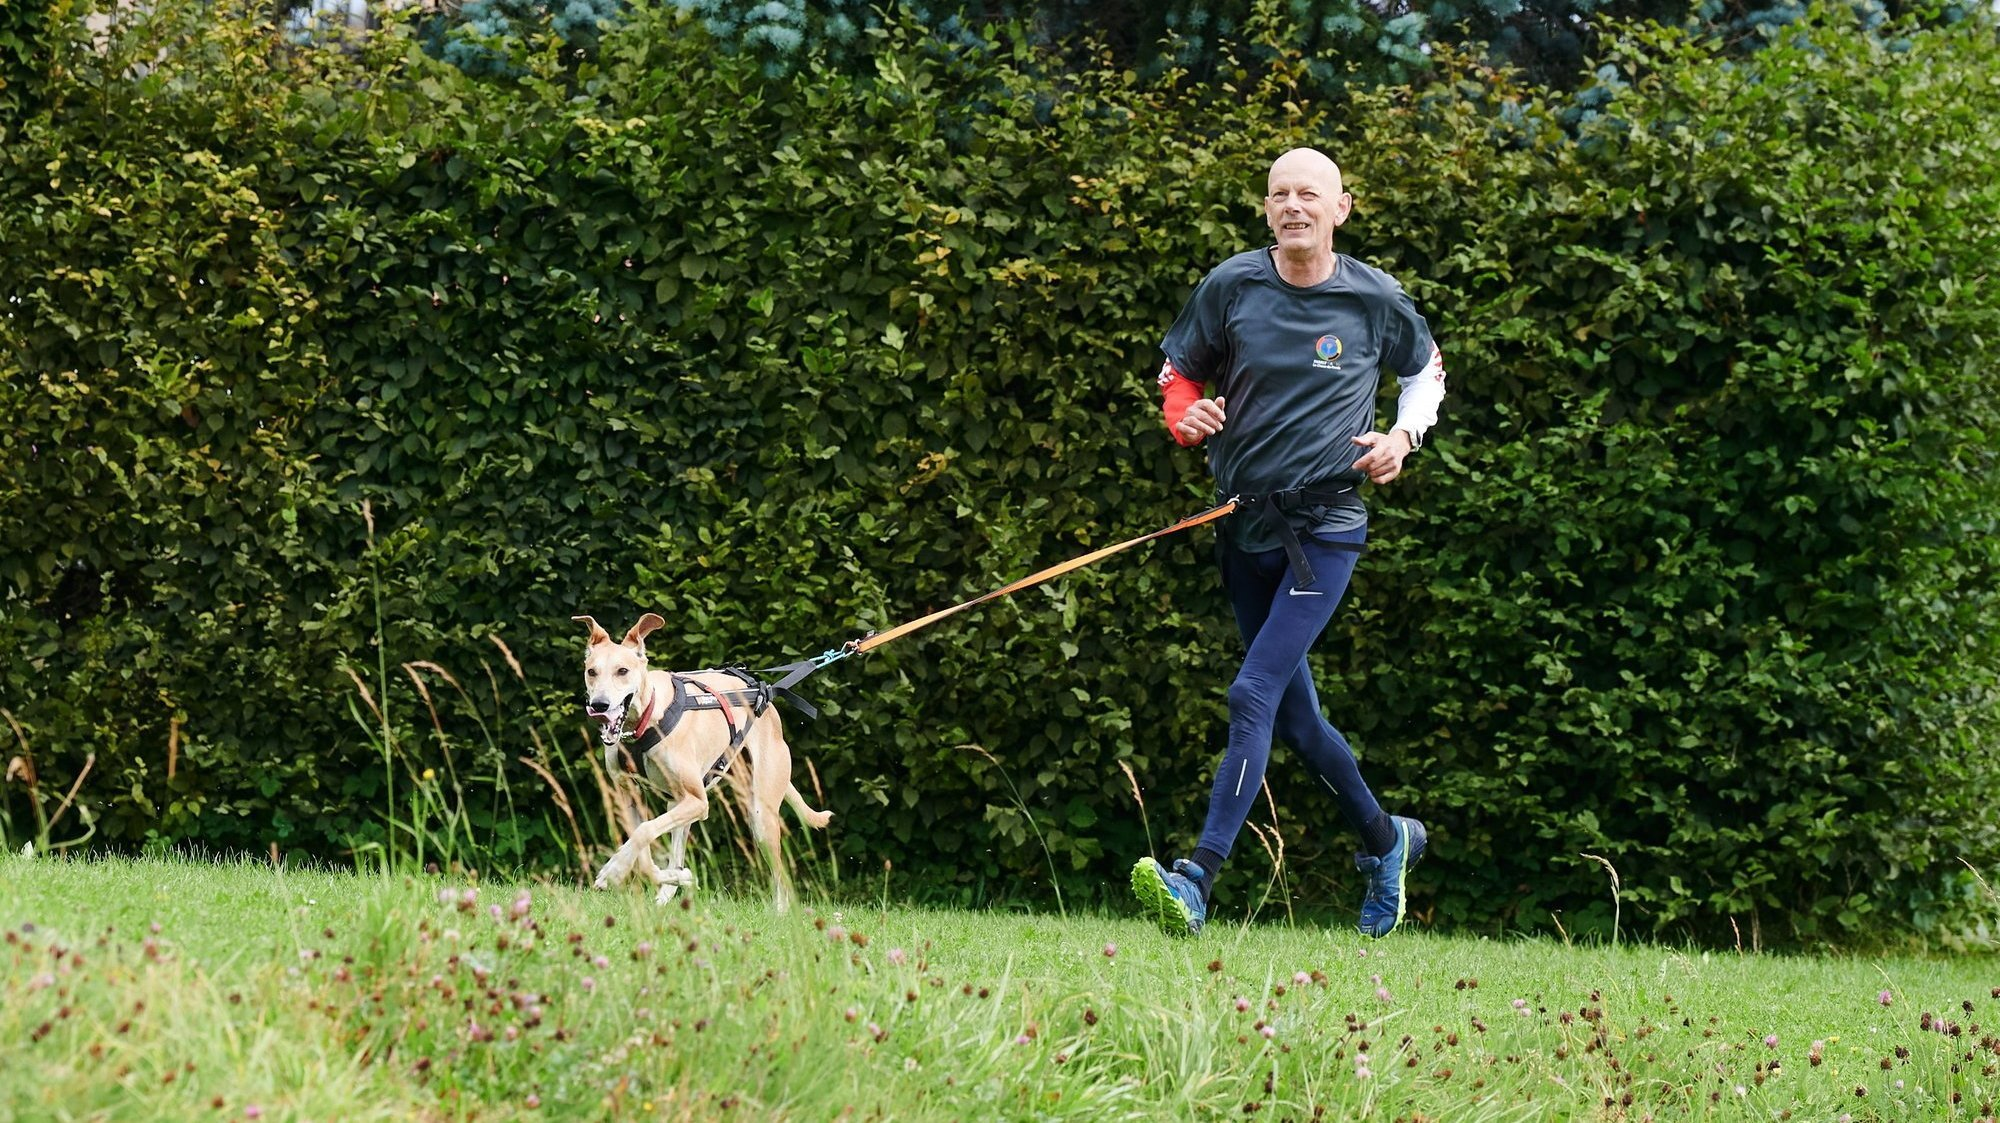 Daniel Koch dans sa démonstration de canicross avec sa chienne Bundji lors des Family Games.